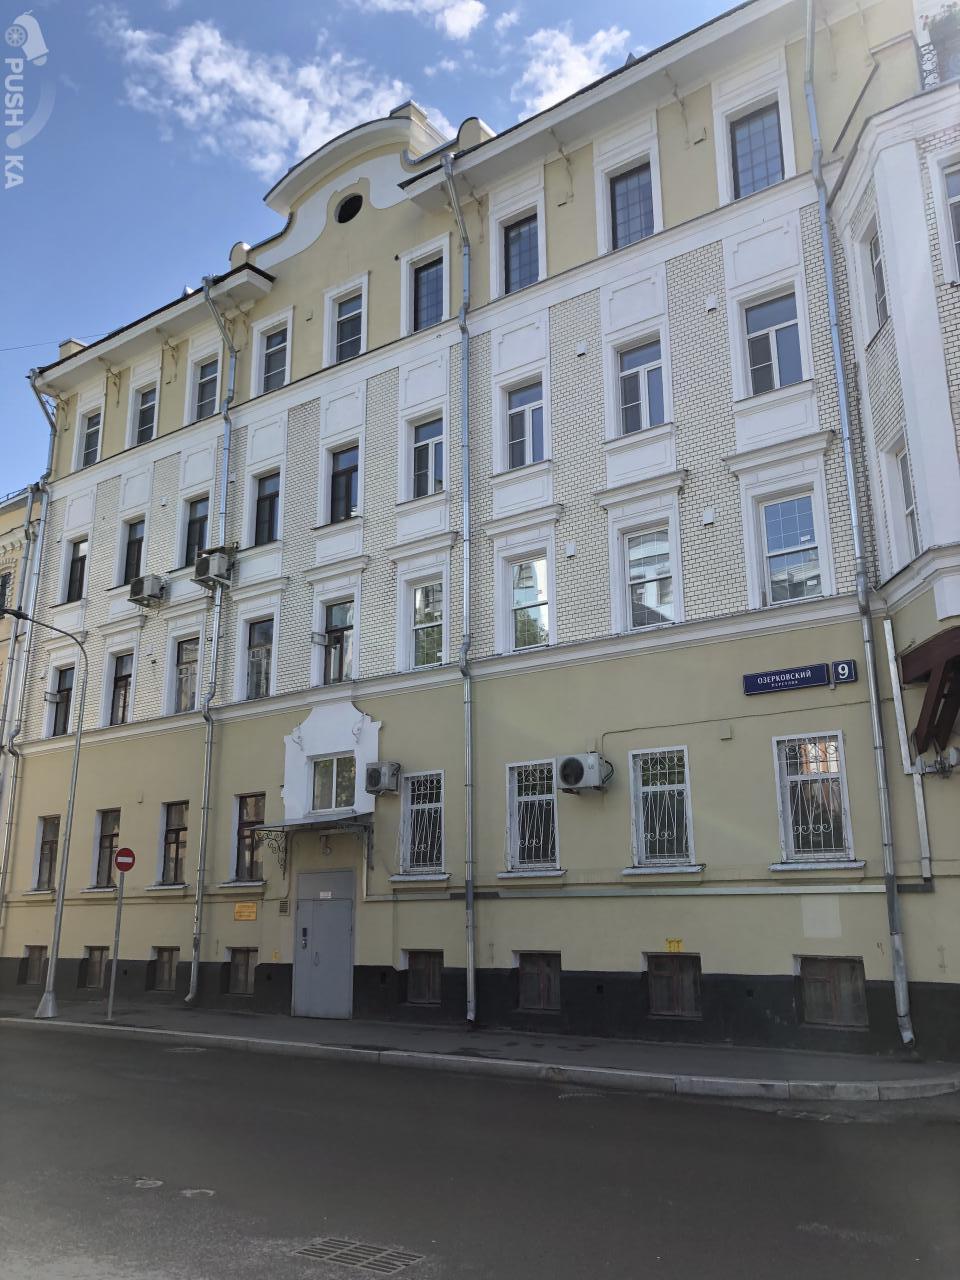 Продаётся 3-комнатная квартира 73.0 кв.м. этаж 2/4 за 24 000 000 руб